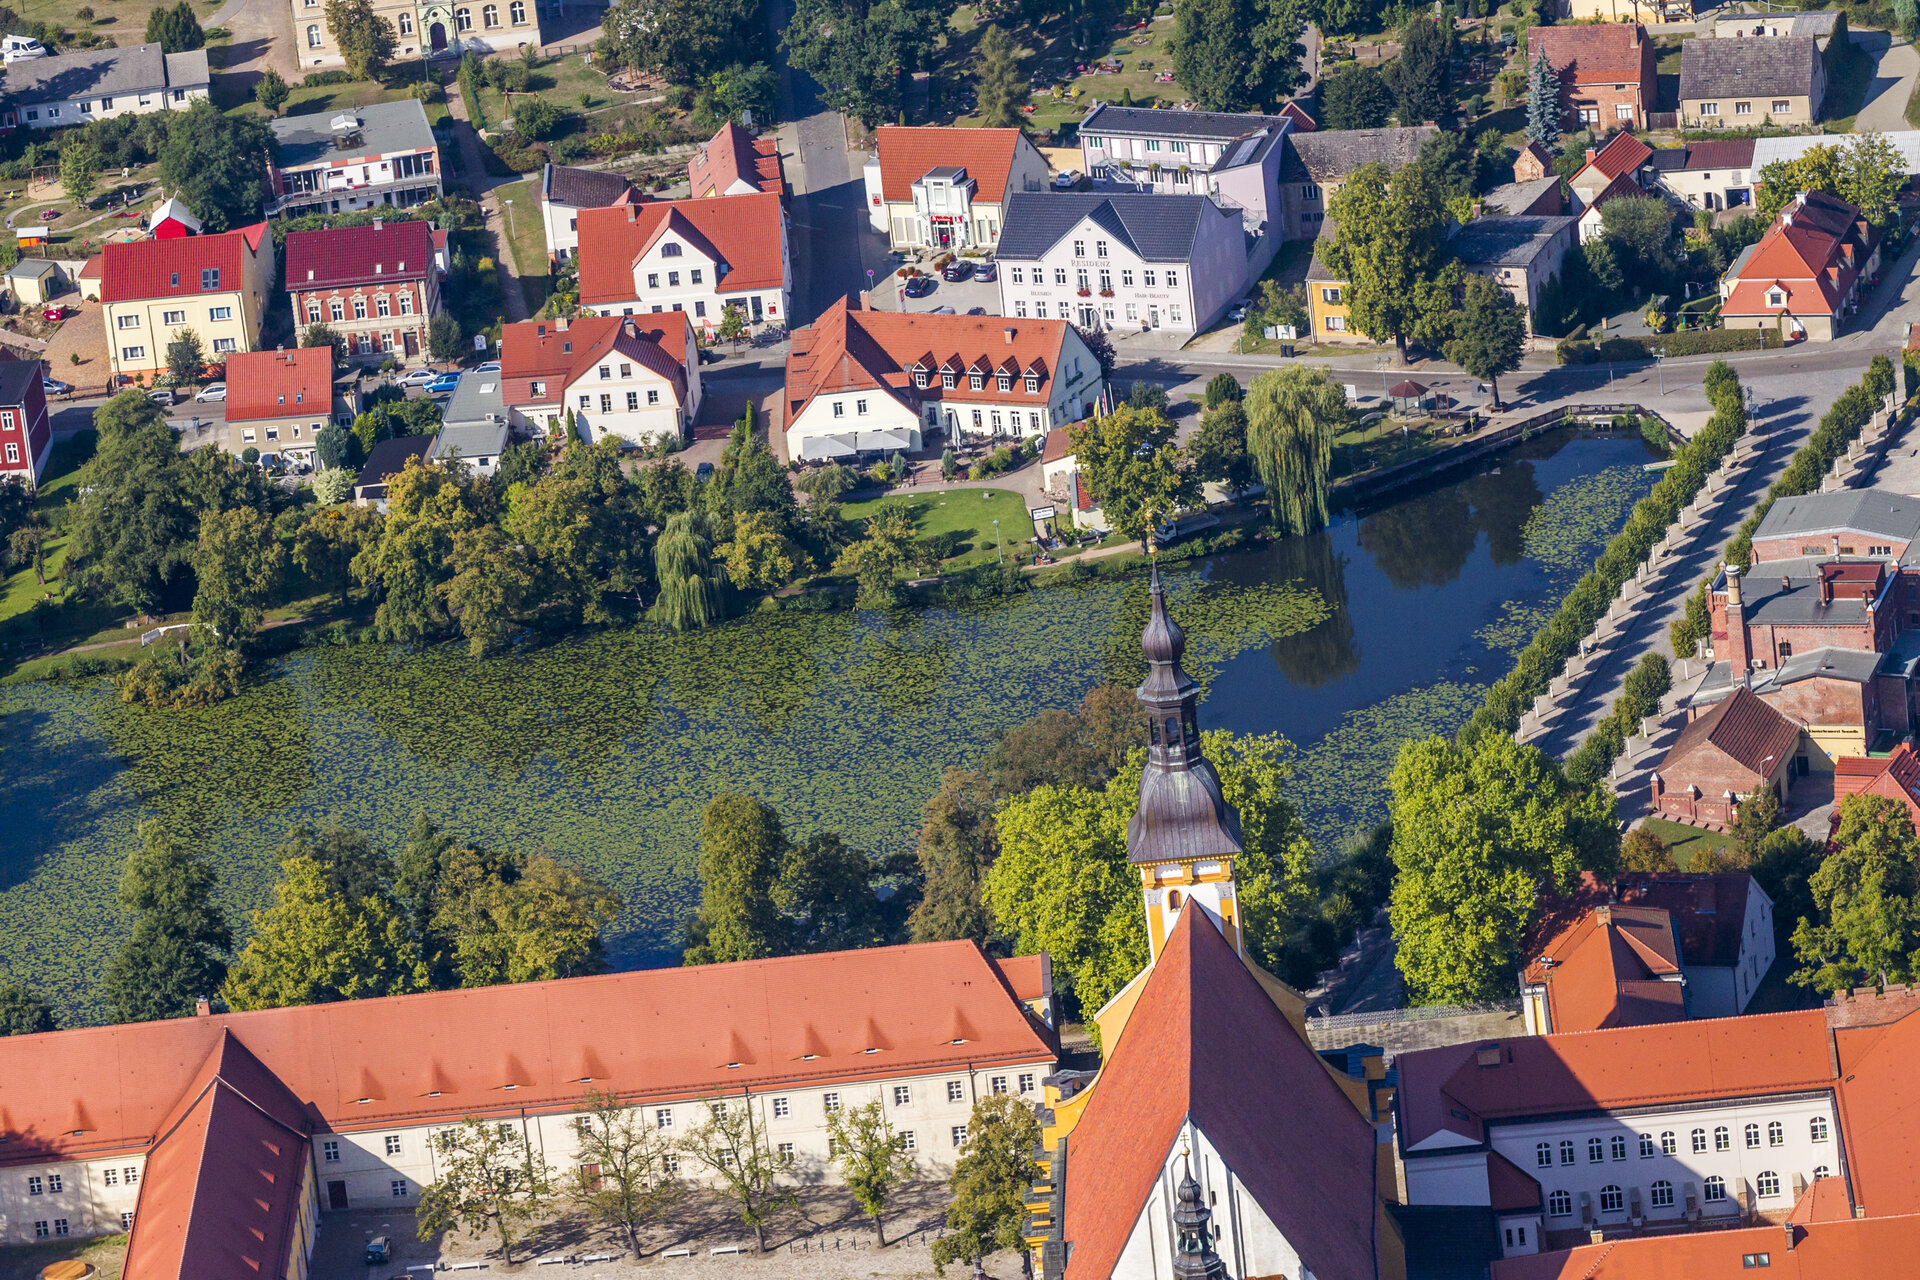 Luftbildaufnahme Prinz Albrecht Foto: Bernd Geller